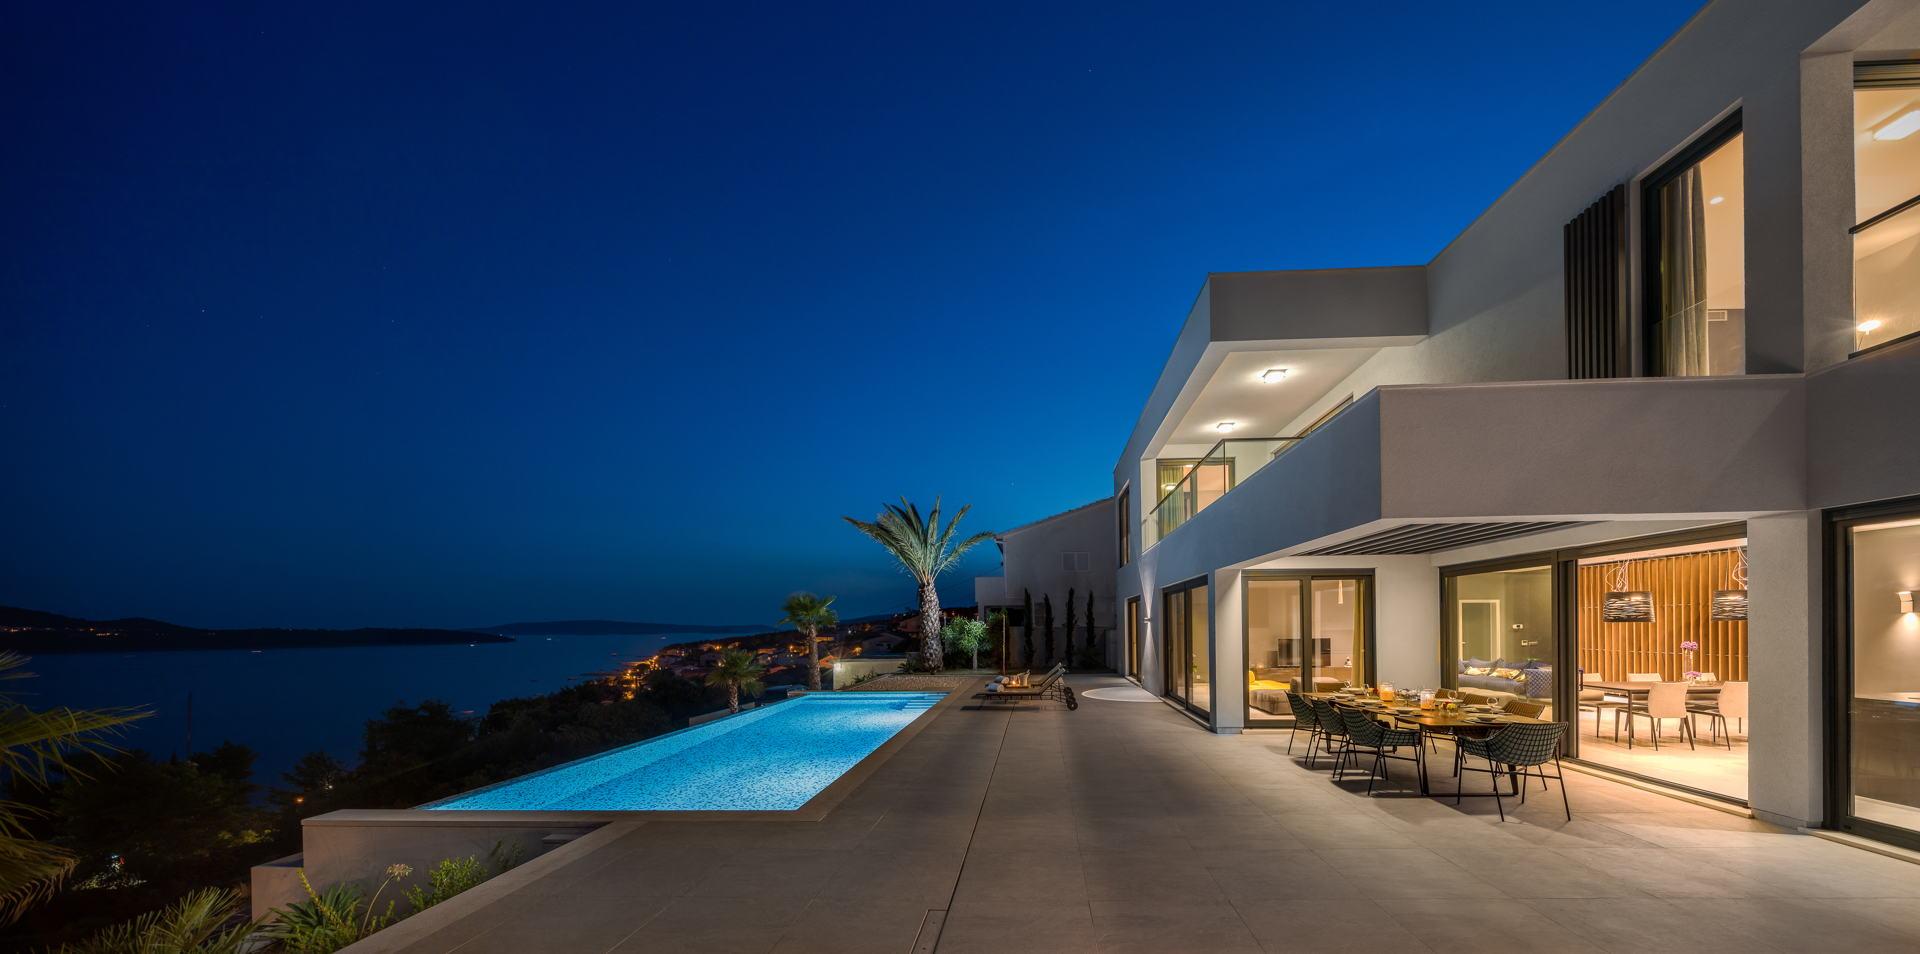 Villa Elyzeum Trogir View of the Islands and the Sea